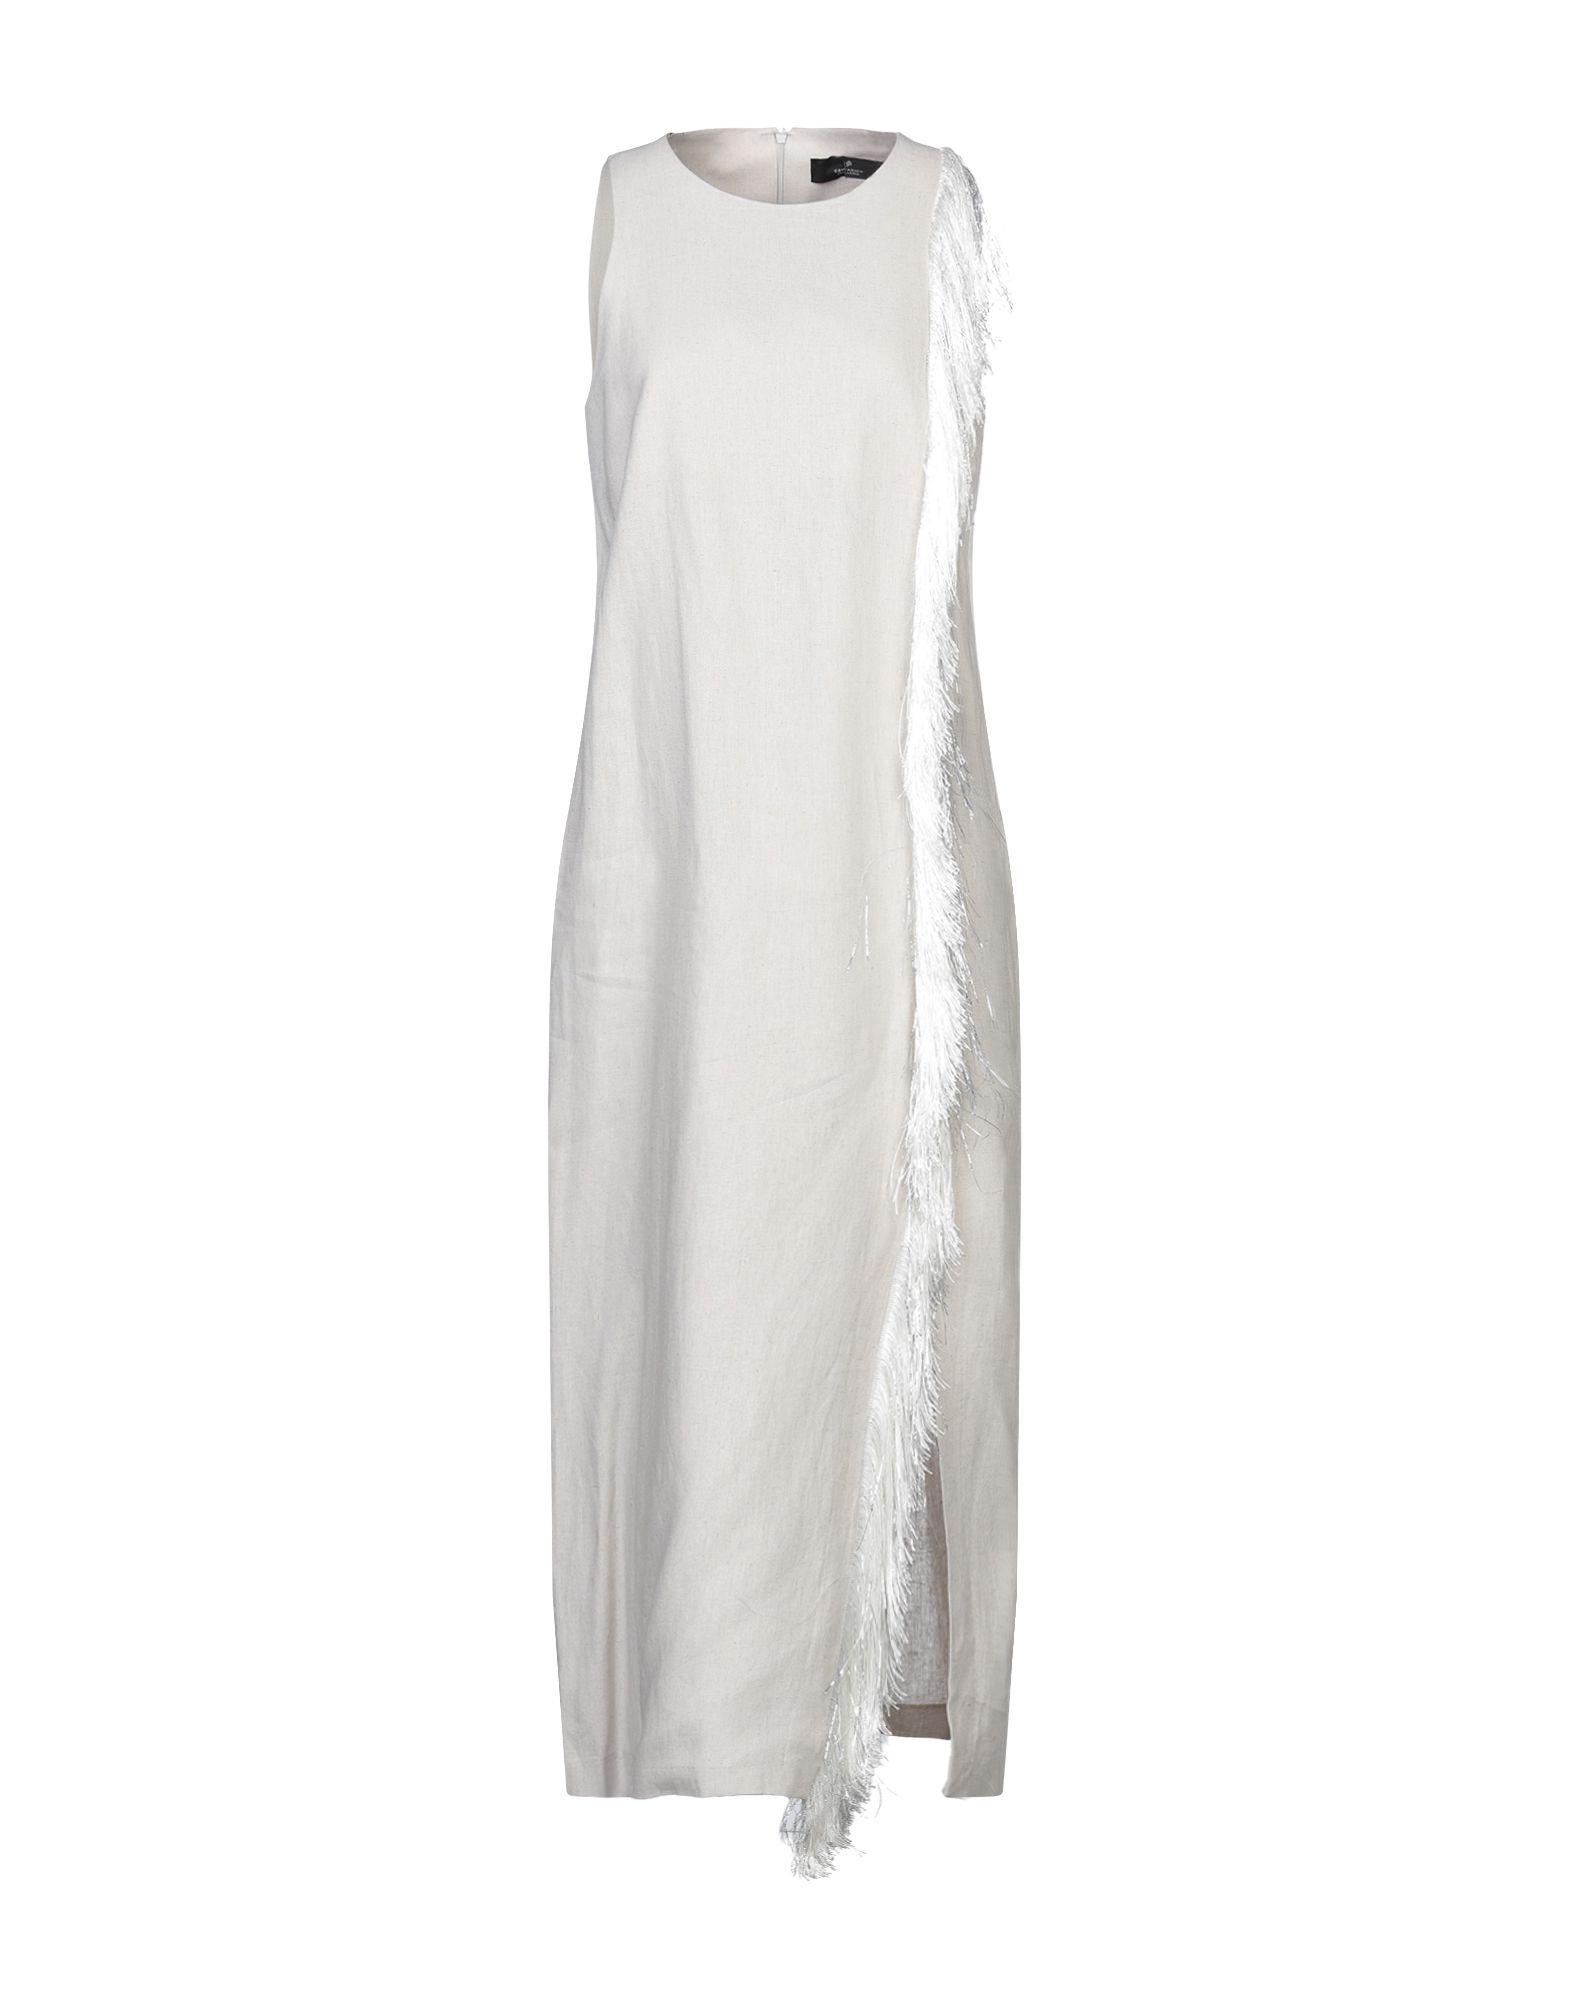 COMPAGNIA ITALIANA Платье длиной 3/4 комплект 3 предмета compagnia italiana